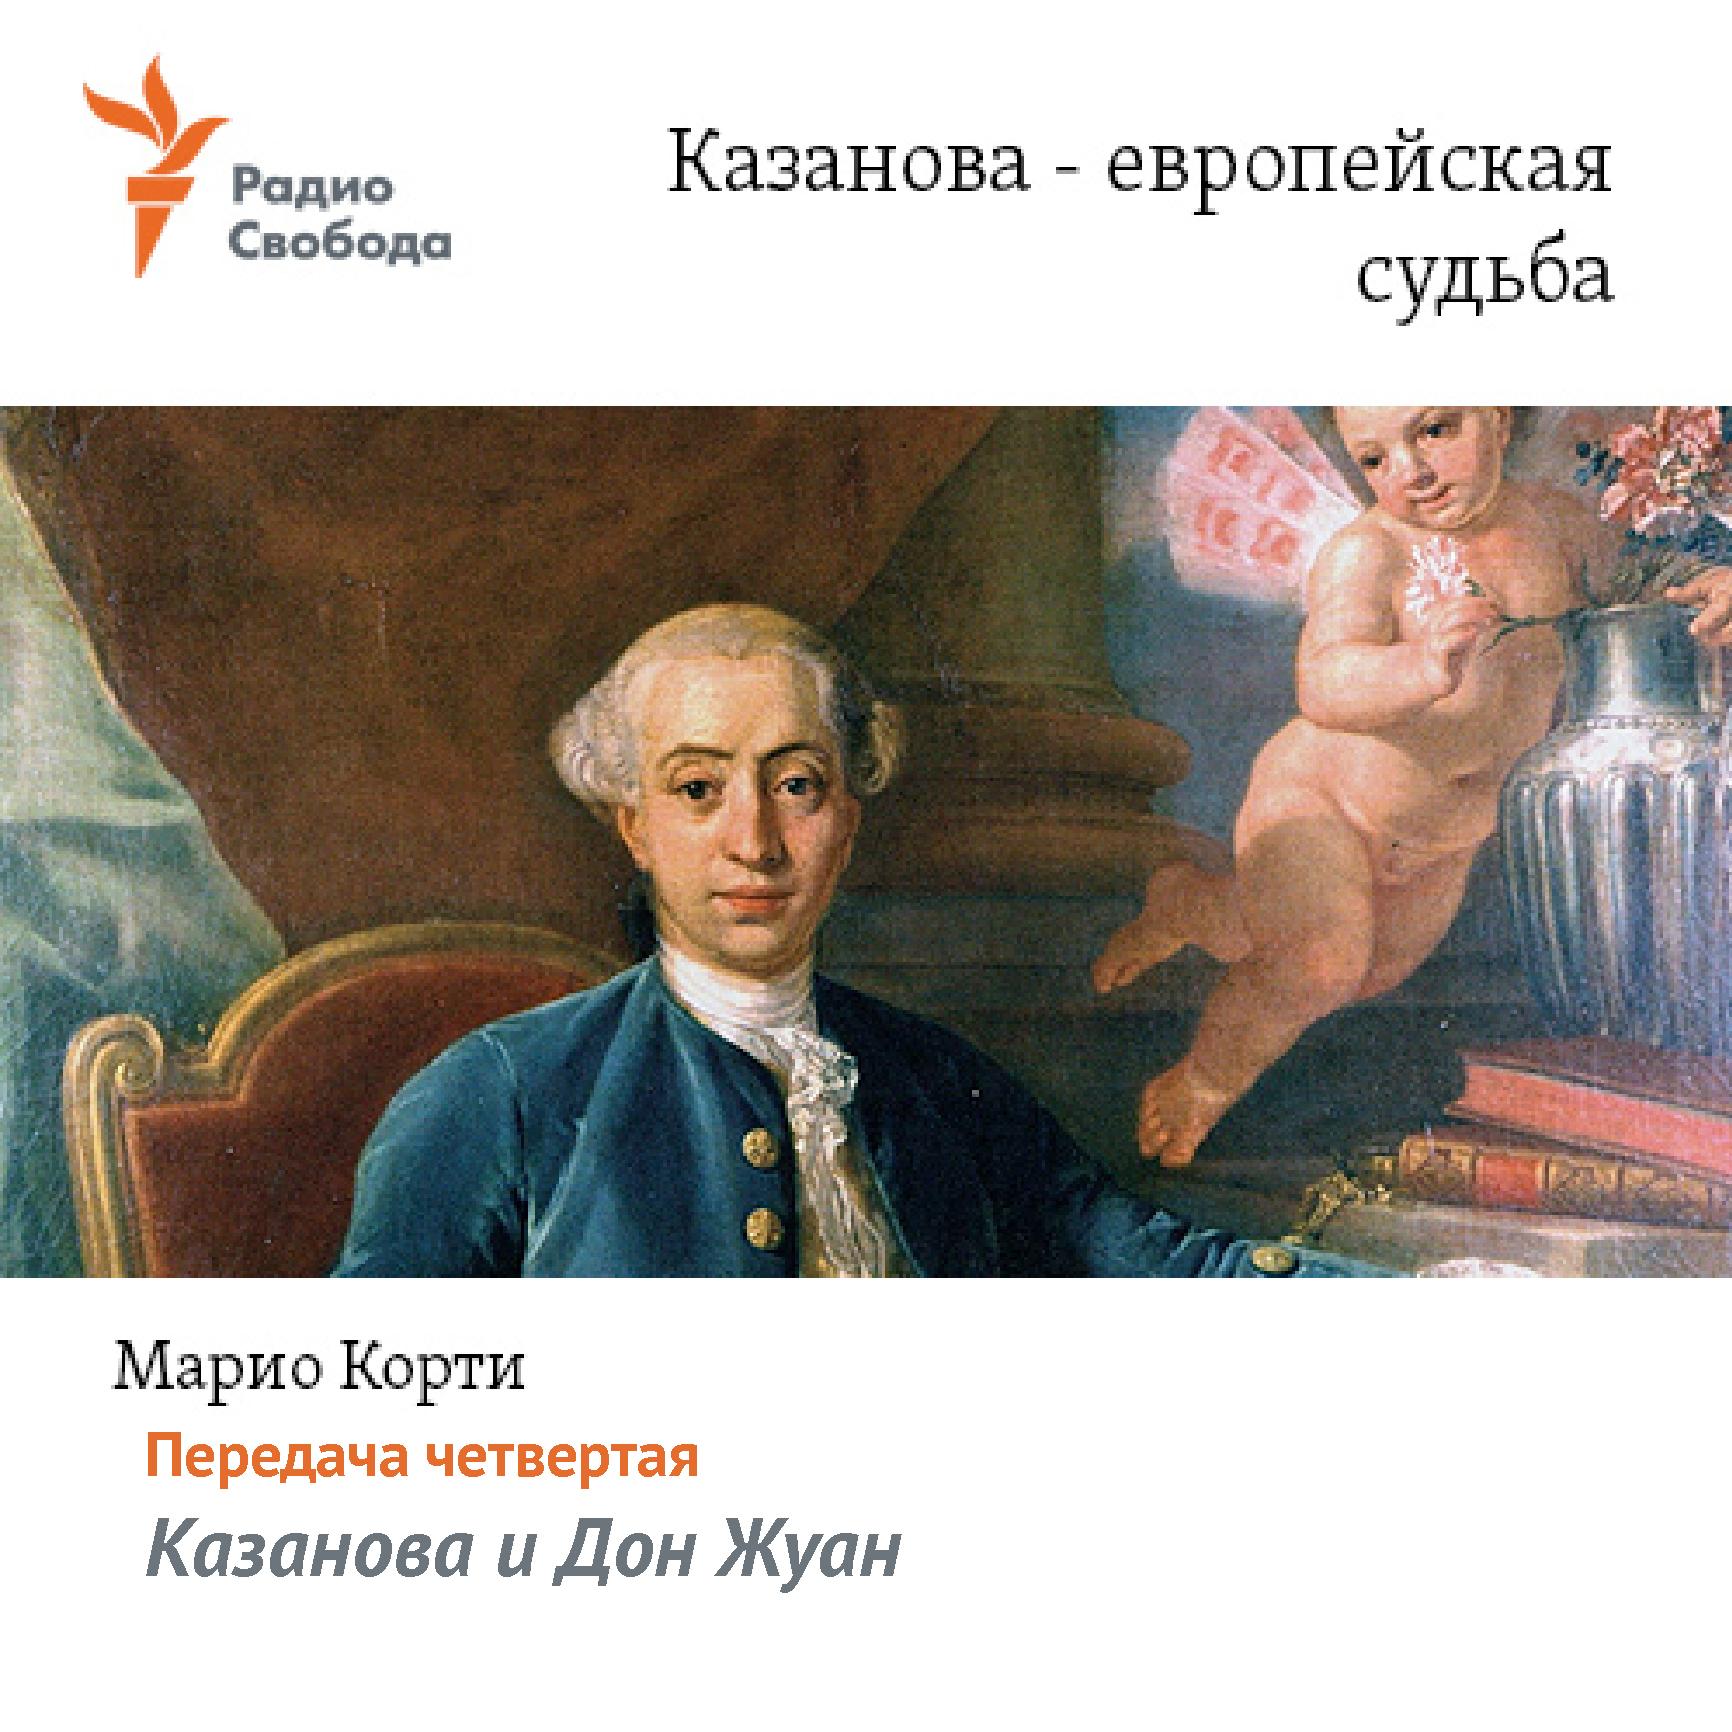 Марио Корти Казанова – европейская судьба. Передача четвертая – «Казанова и Дон Жуан» цена